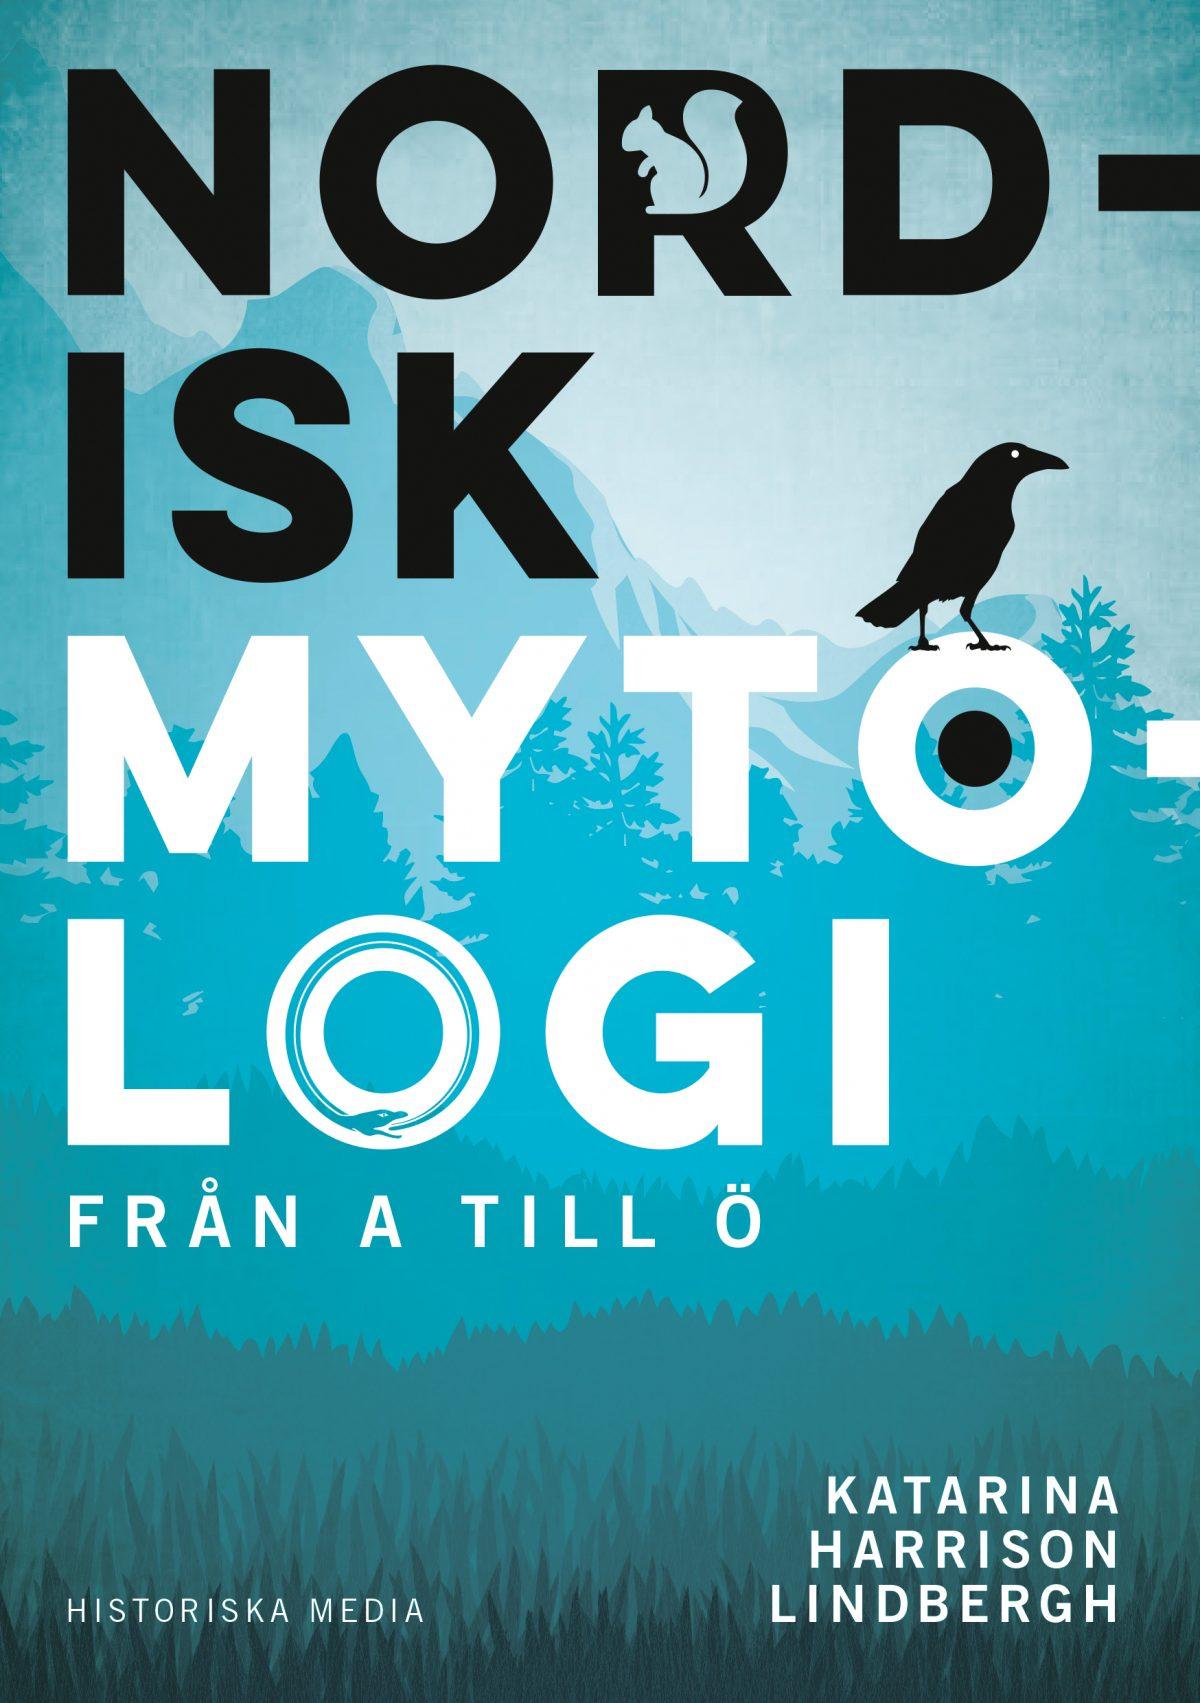 Nordisk mytologi från A-Ö  – Katarina Harrison Lindbergh Alvesta Bokhandel